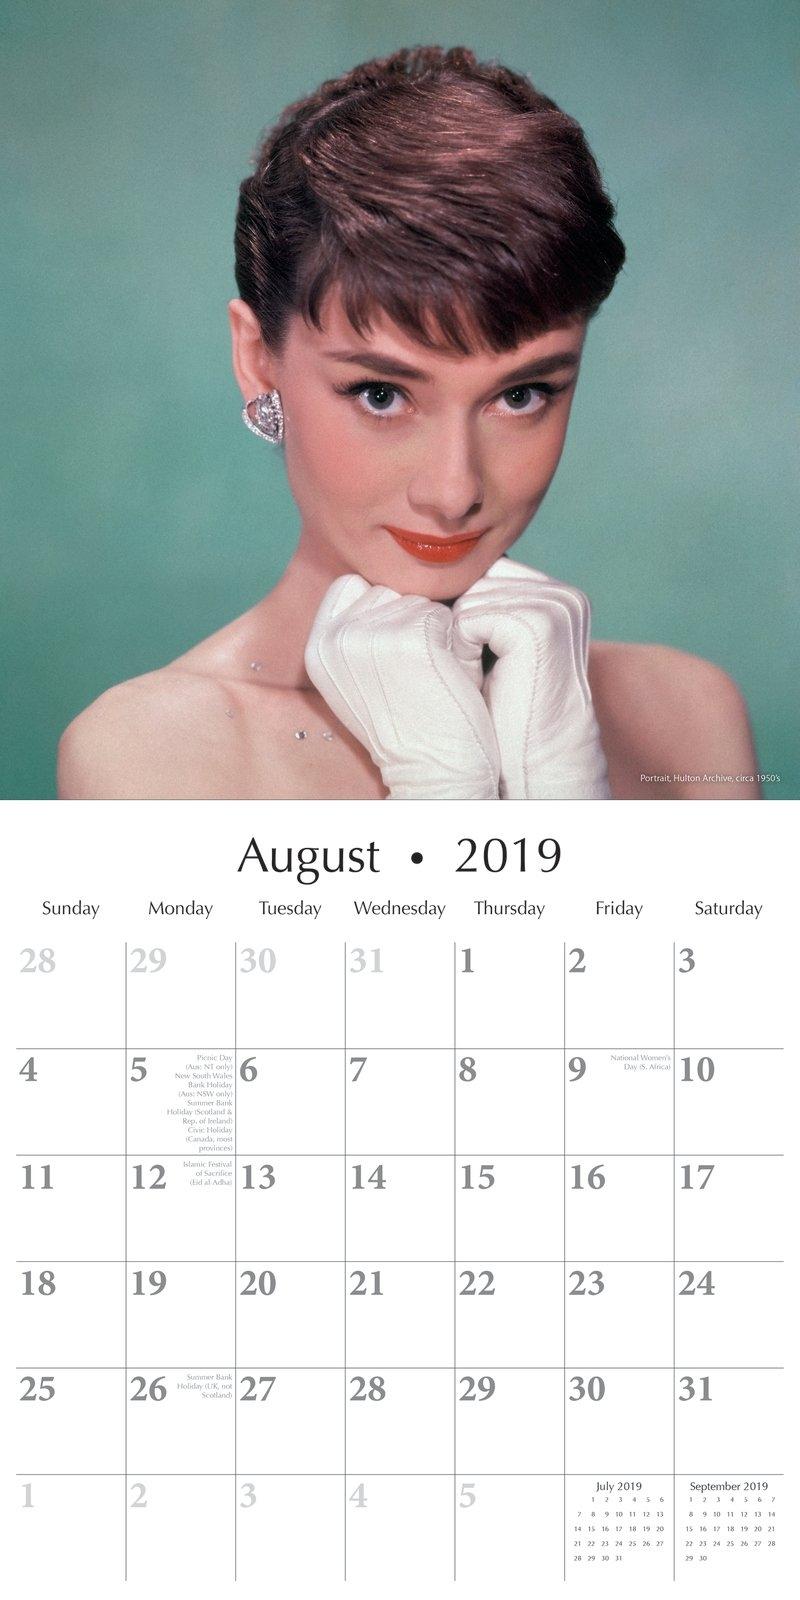 Audrey Hepburn – 2019 Wall Calendar 16 Month Premium Square 30X30Cm X Calendar 2019 Models